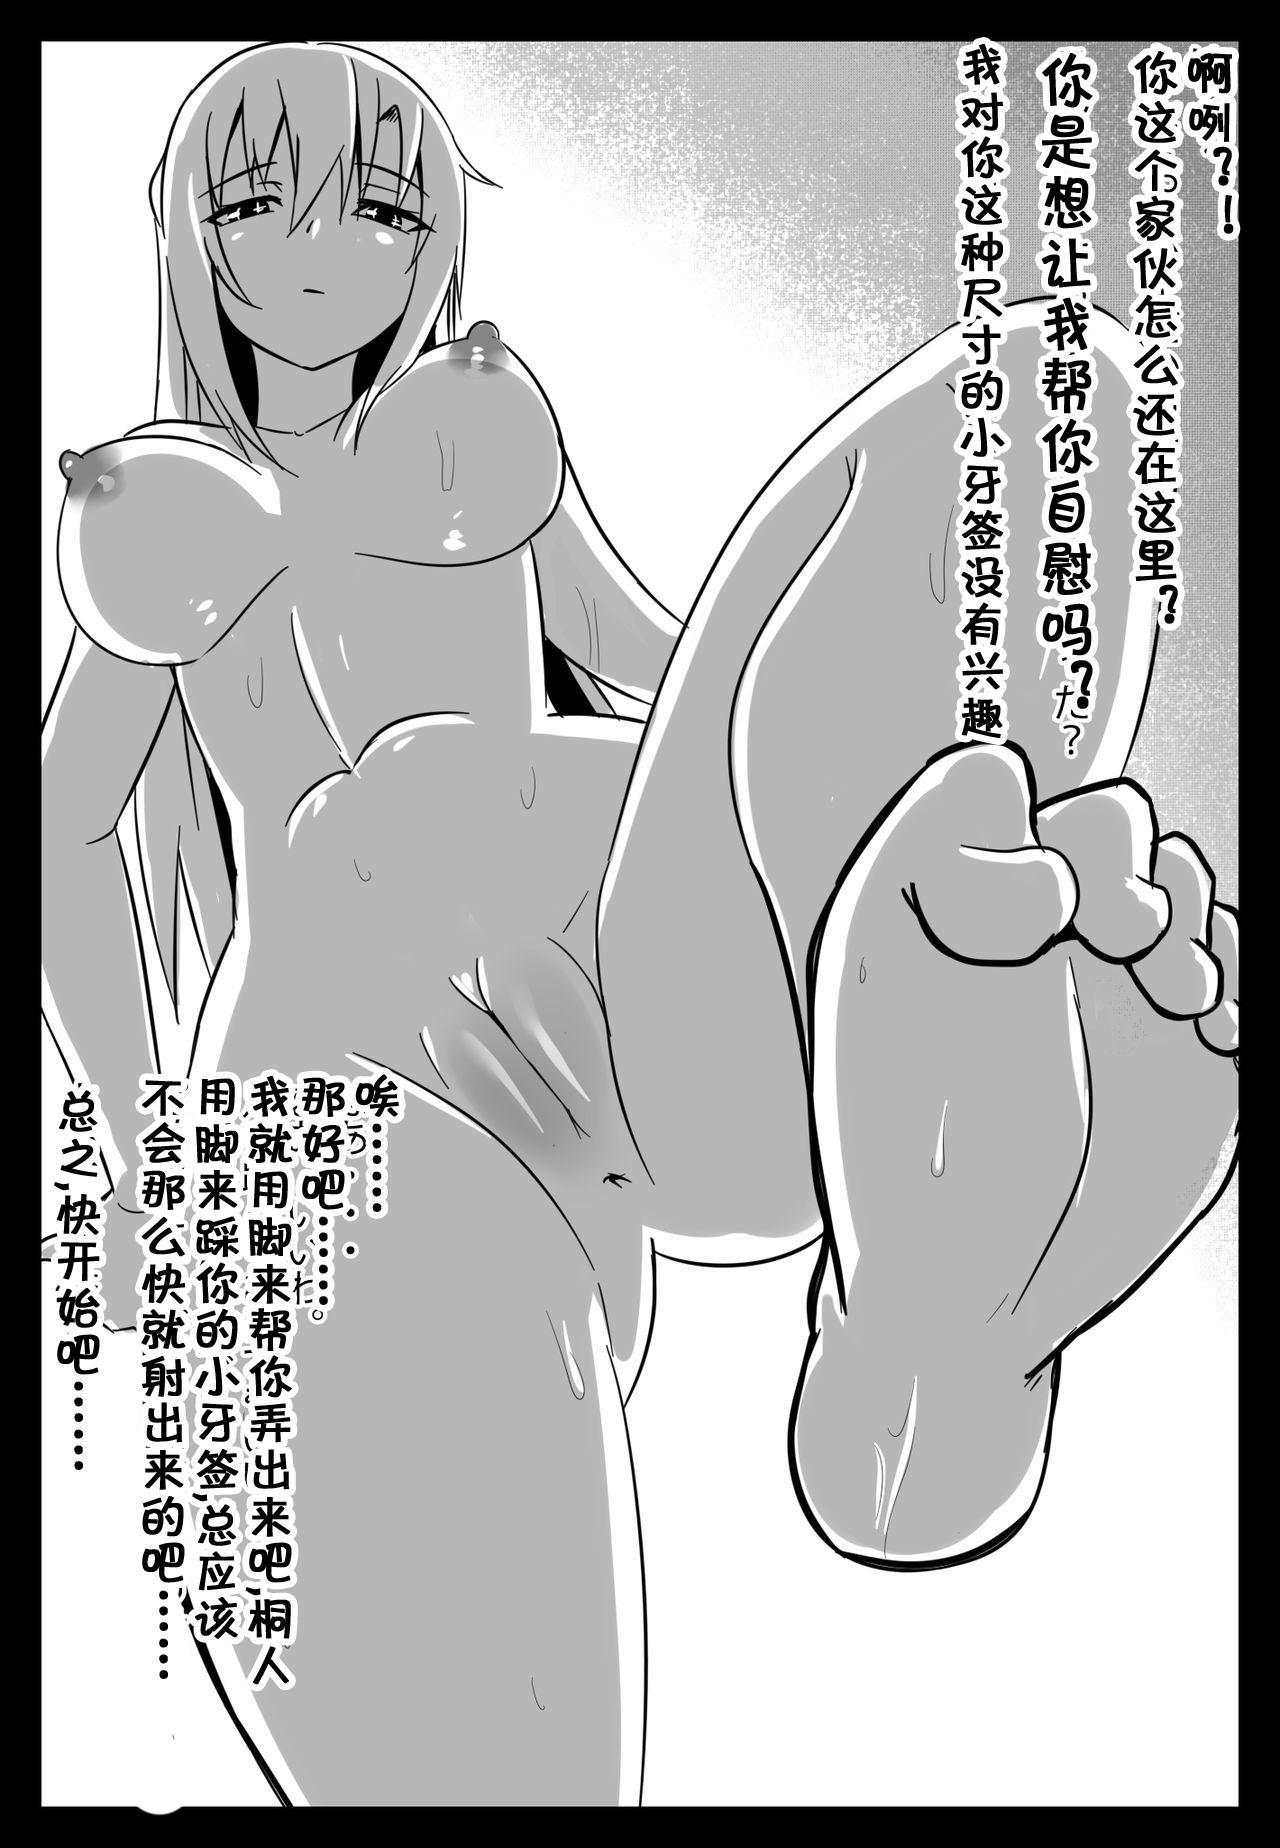 [Merkonig] B-Trayal 19-2 (Sword Art Online) [Chinese] [流木个人汉化] 13